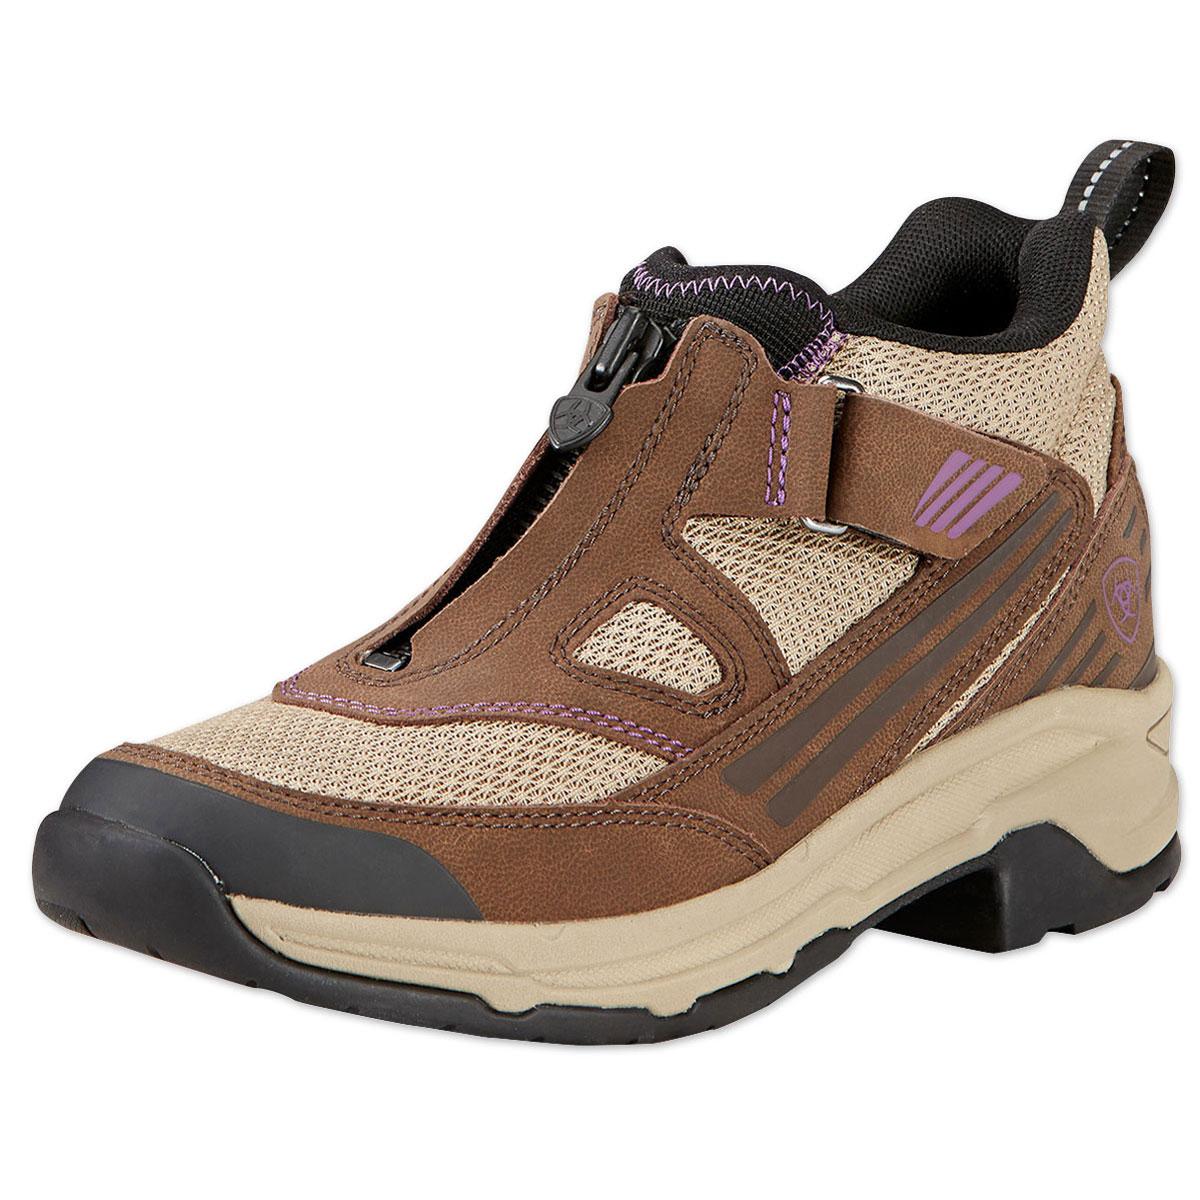 Ariat Maxtrax Zip UL Boot